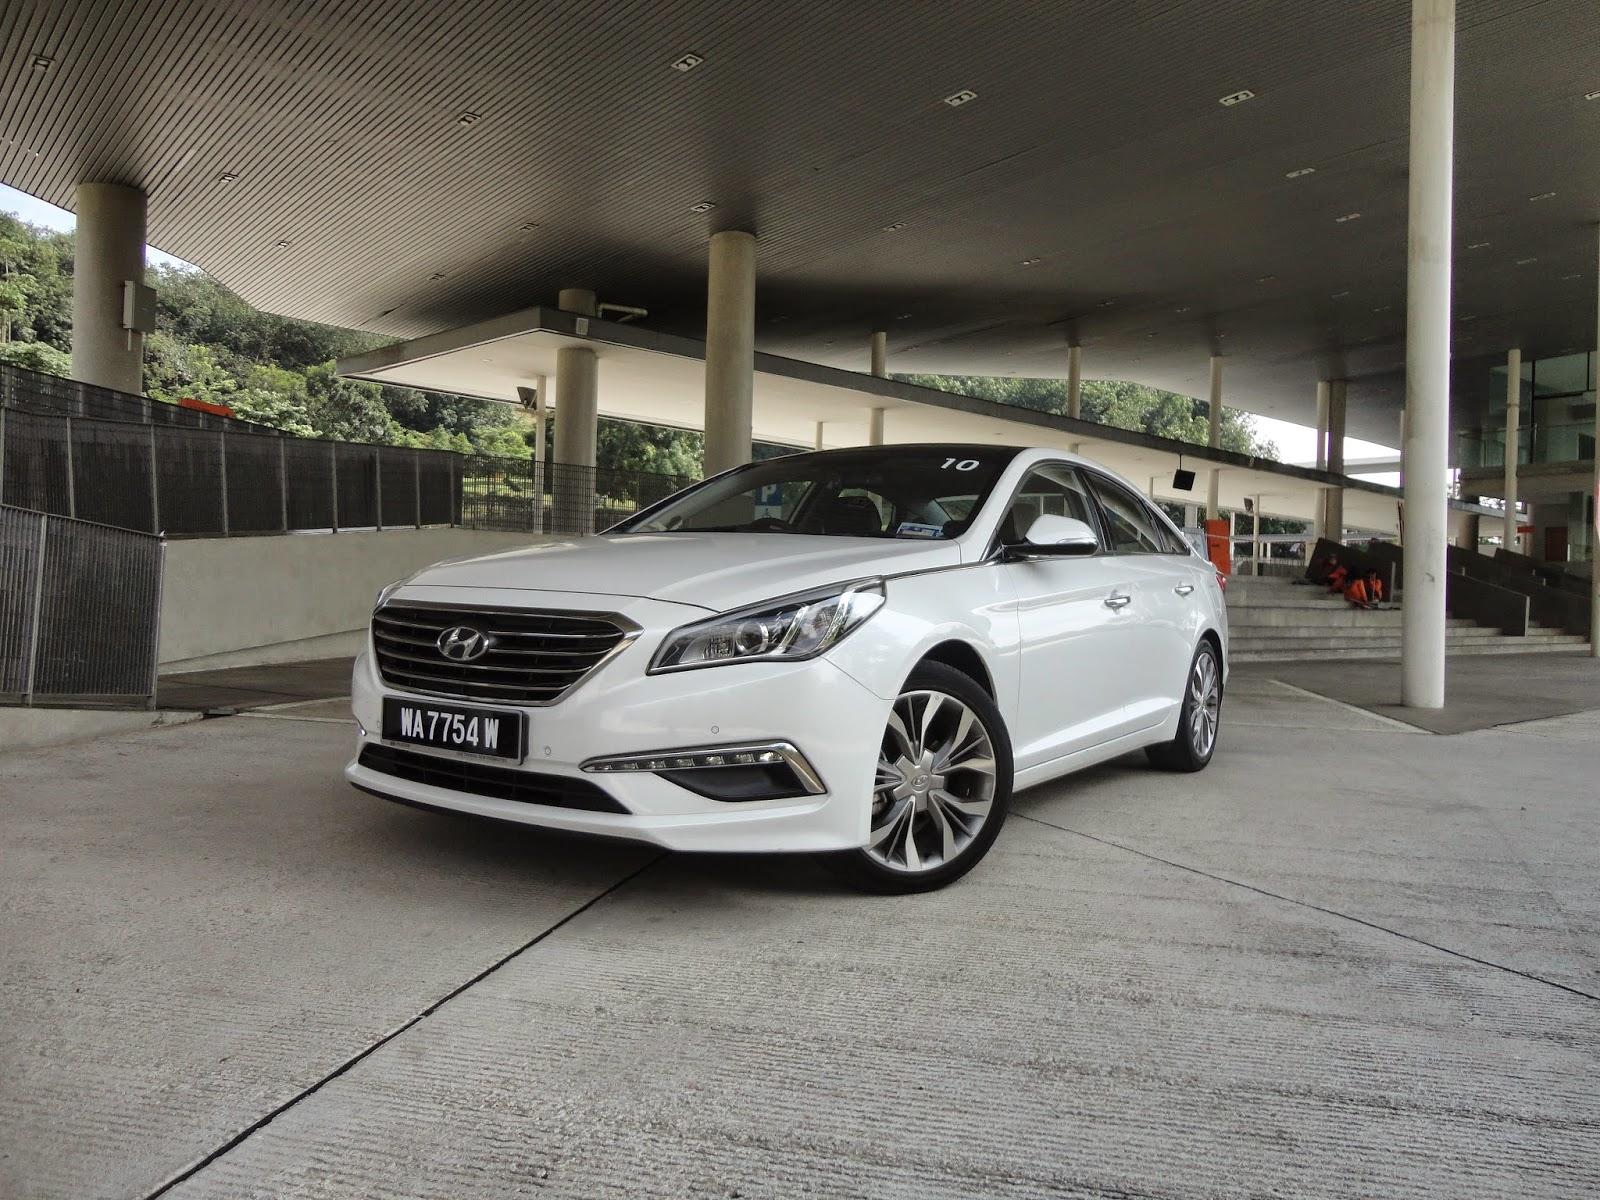 sonata reviews turbo sedan stu sport hyundai s